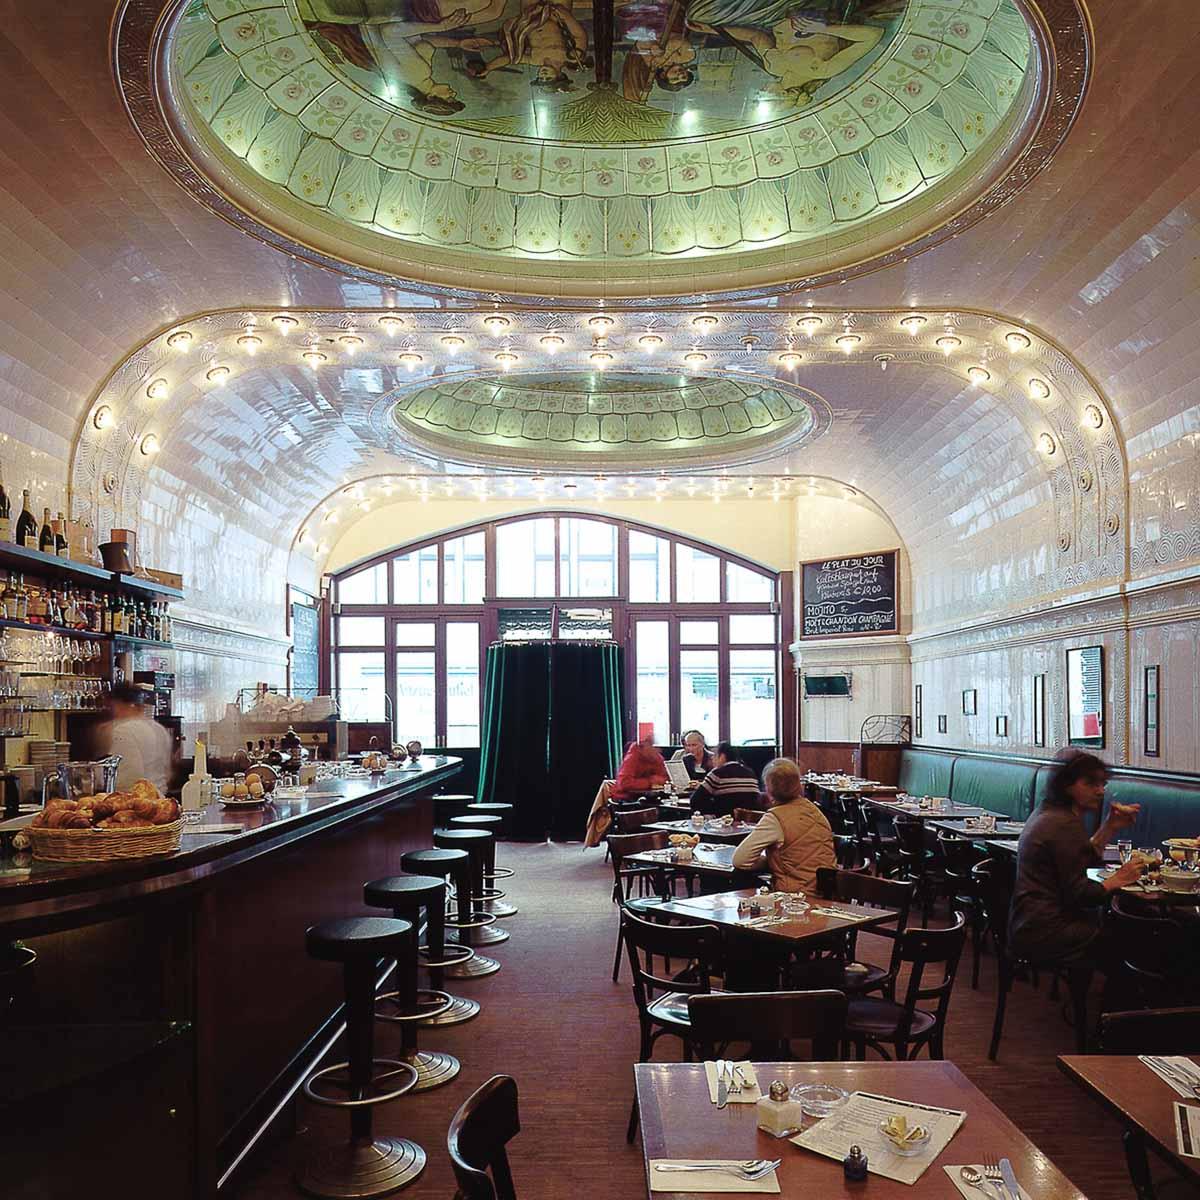 restaurant caf paris in der innenstadt hamburg creme guides. Black Bedroom Furniture Sets. Home Design Ideas